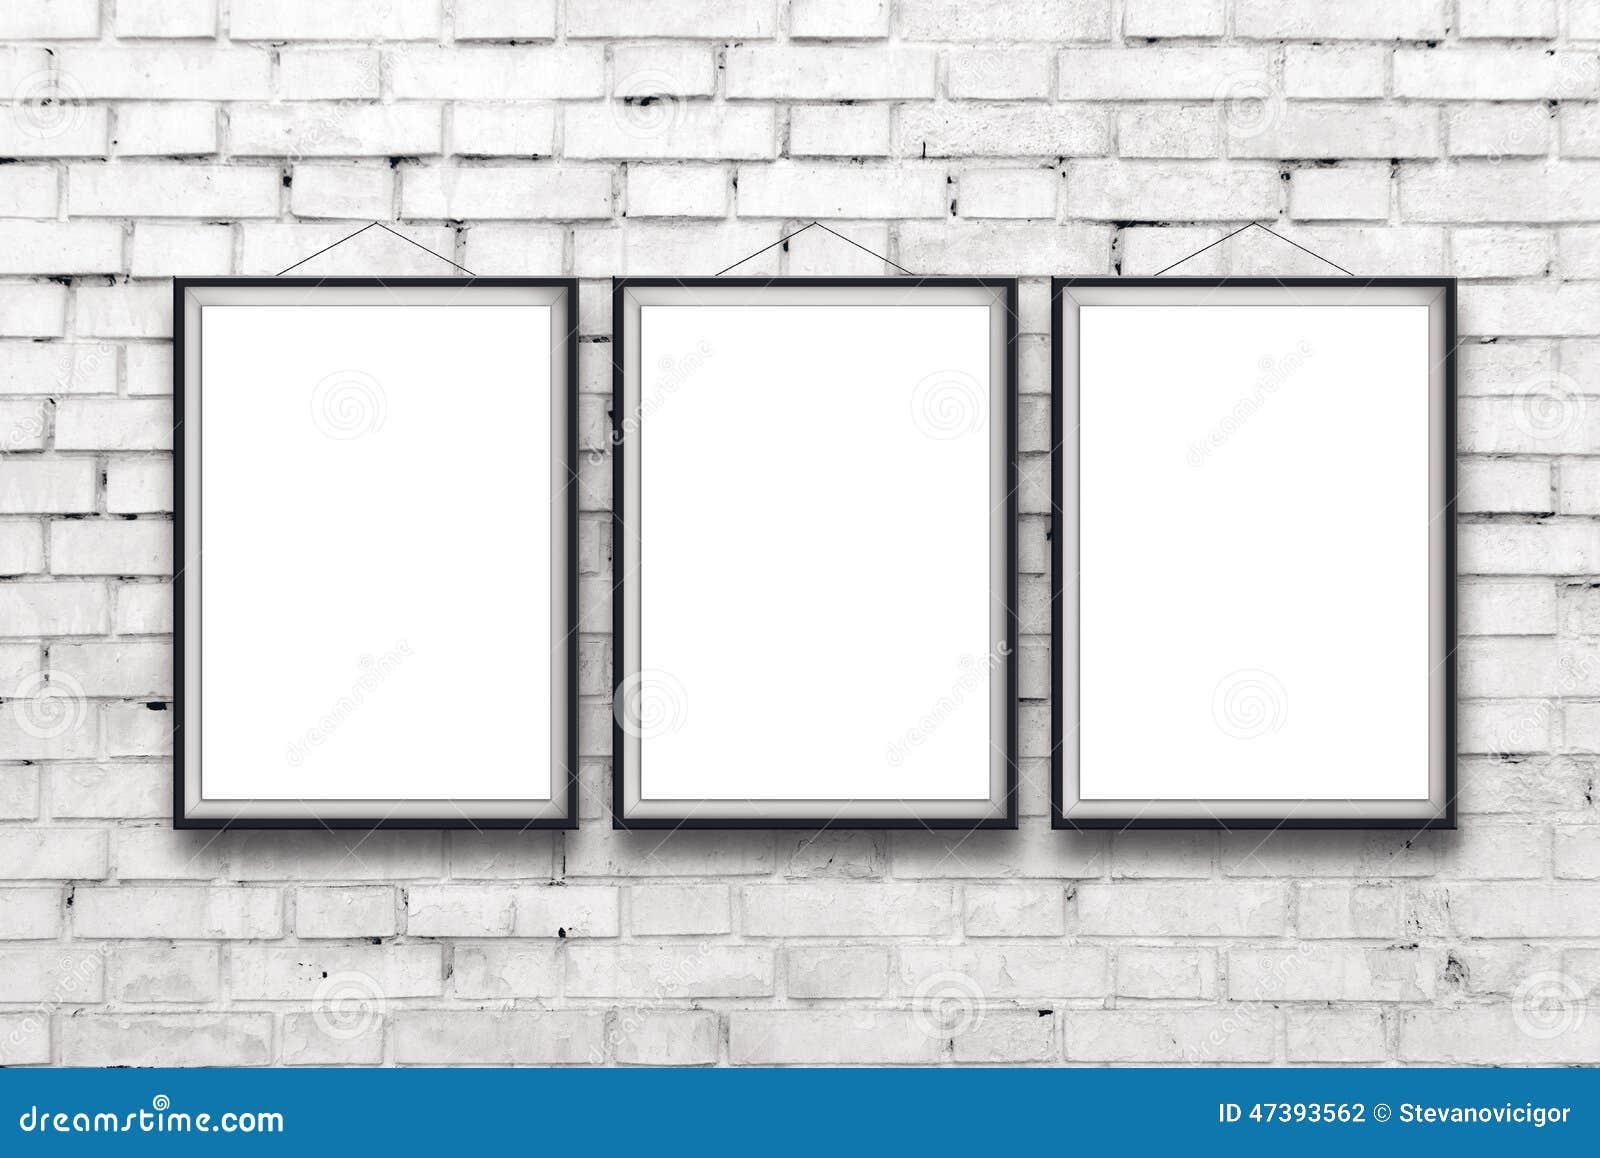 Three blank vertical paintings poster in black frame stock